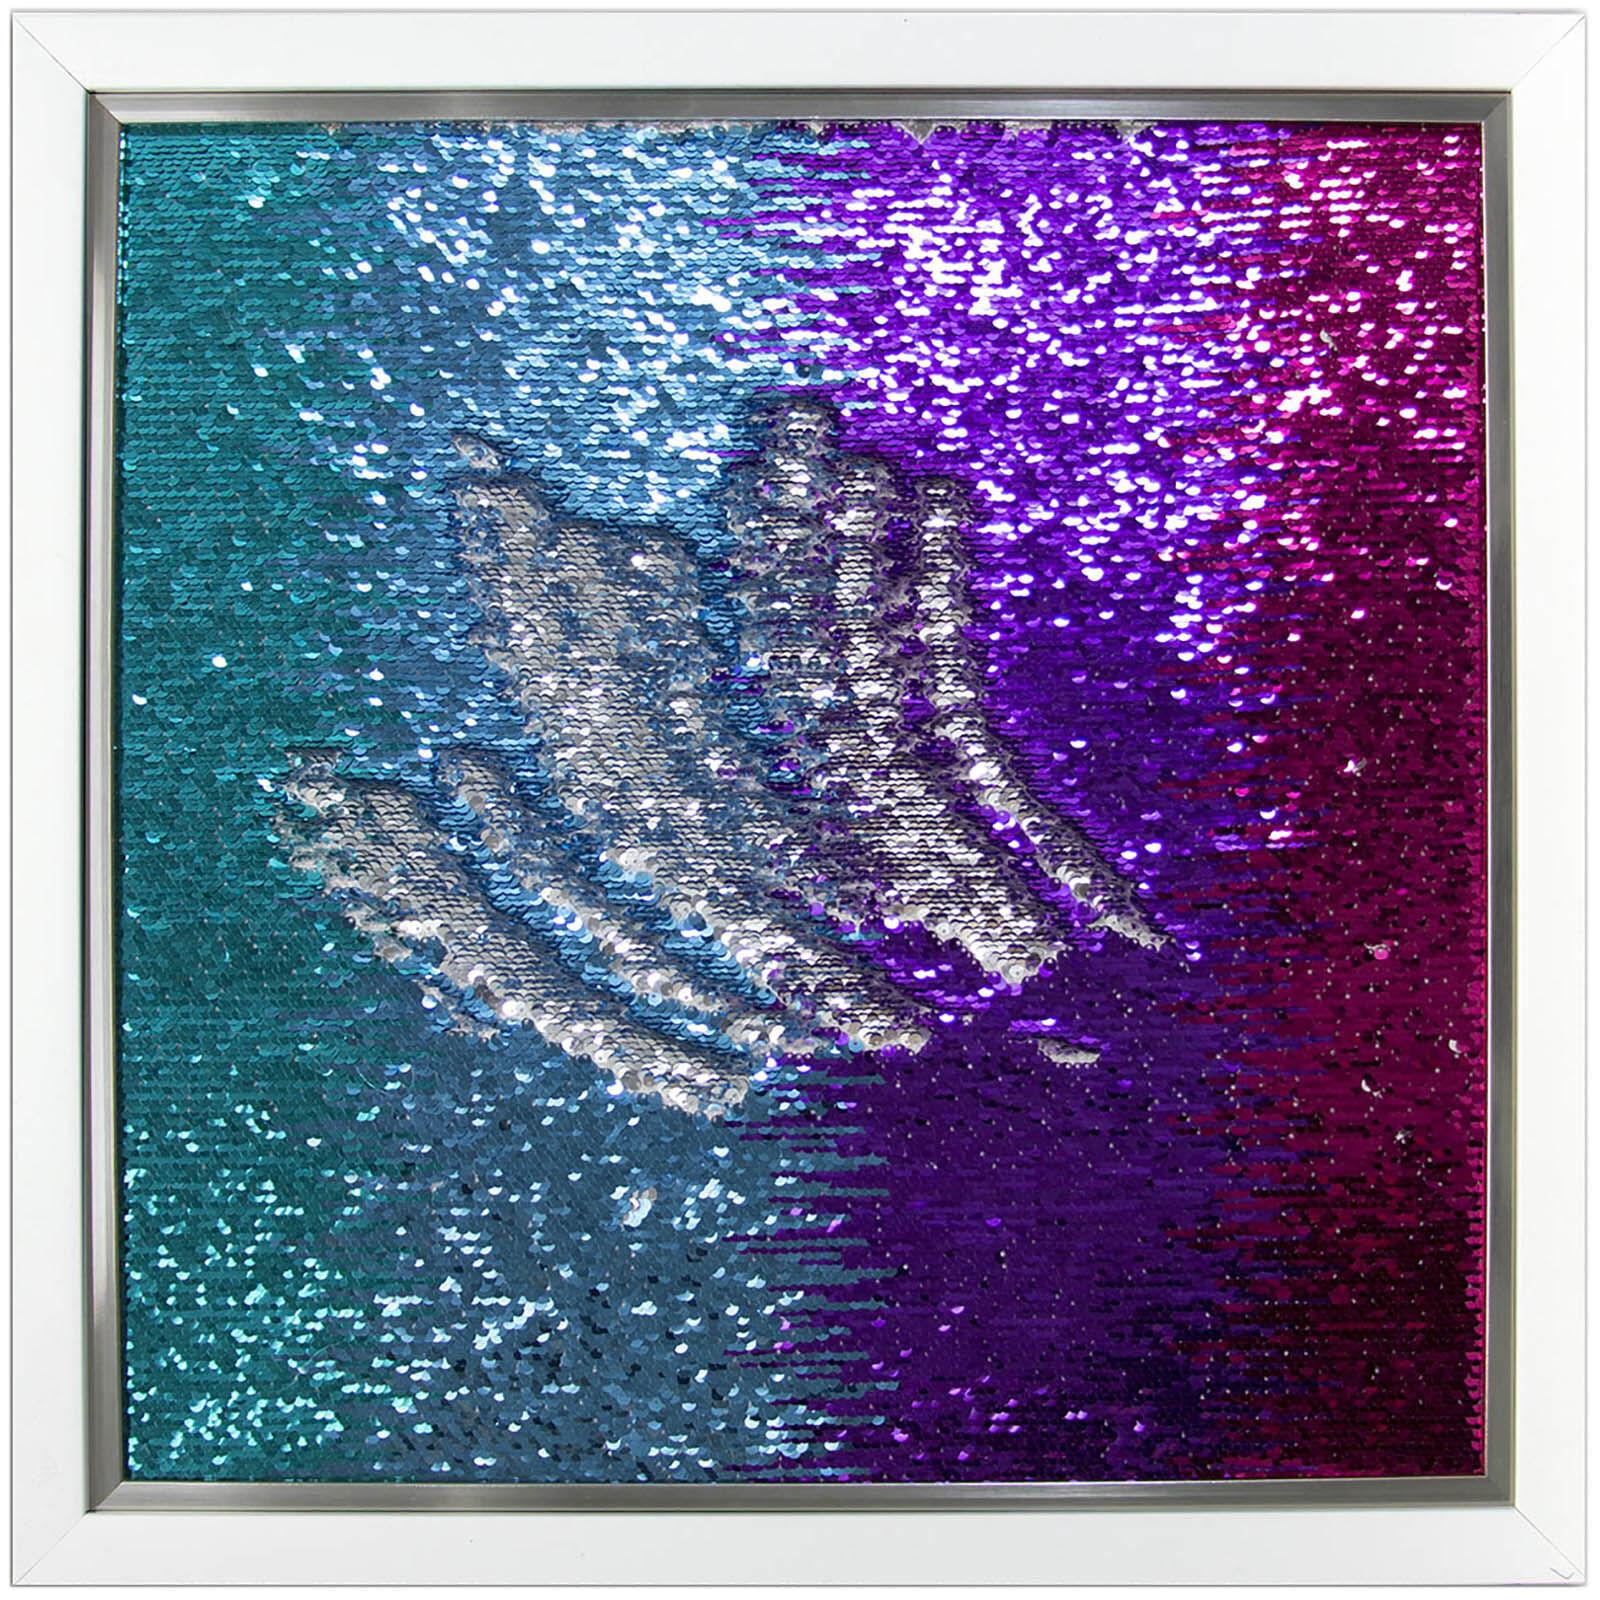 Blue Purple Mermaid Sequin Wall Art- 20 X 20-in. Home